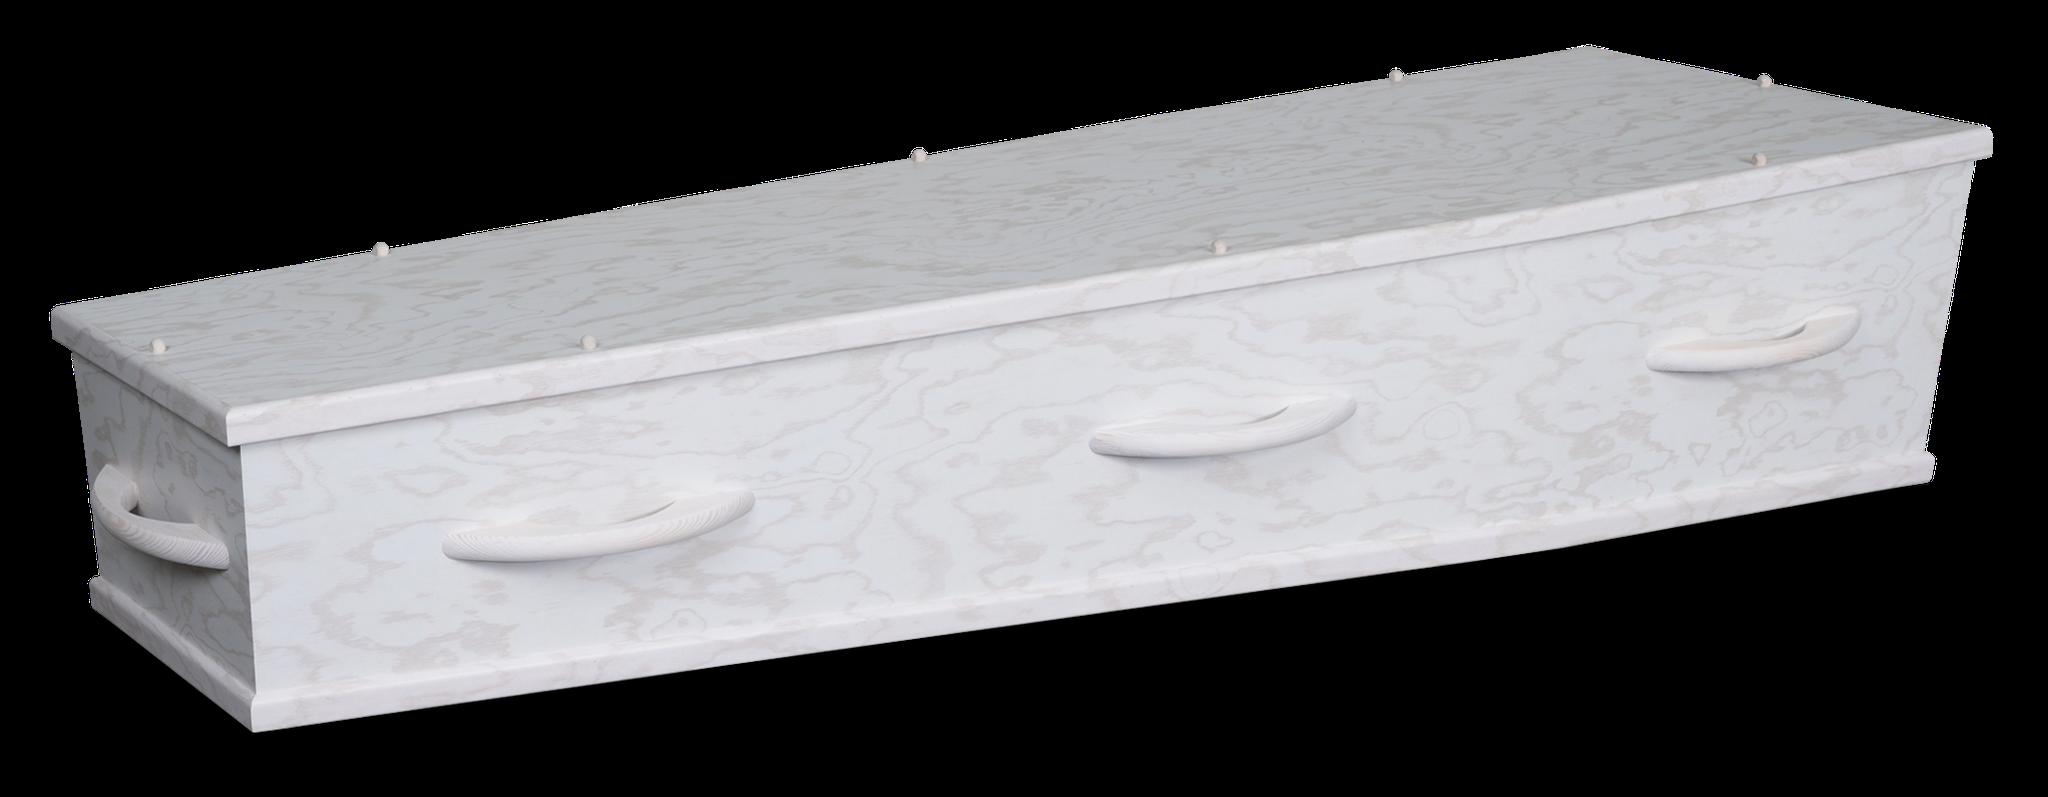 1-60 HC8 Wit, lichtgewicht ecoboard, bekleding strak ongebleekt katoen